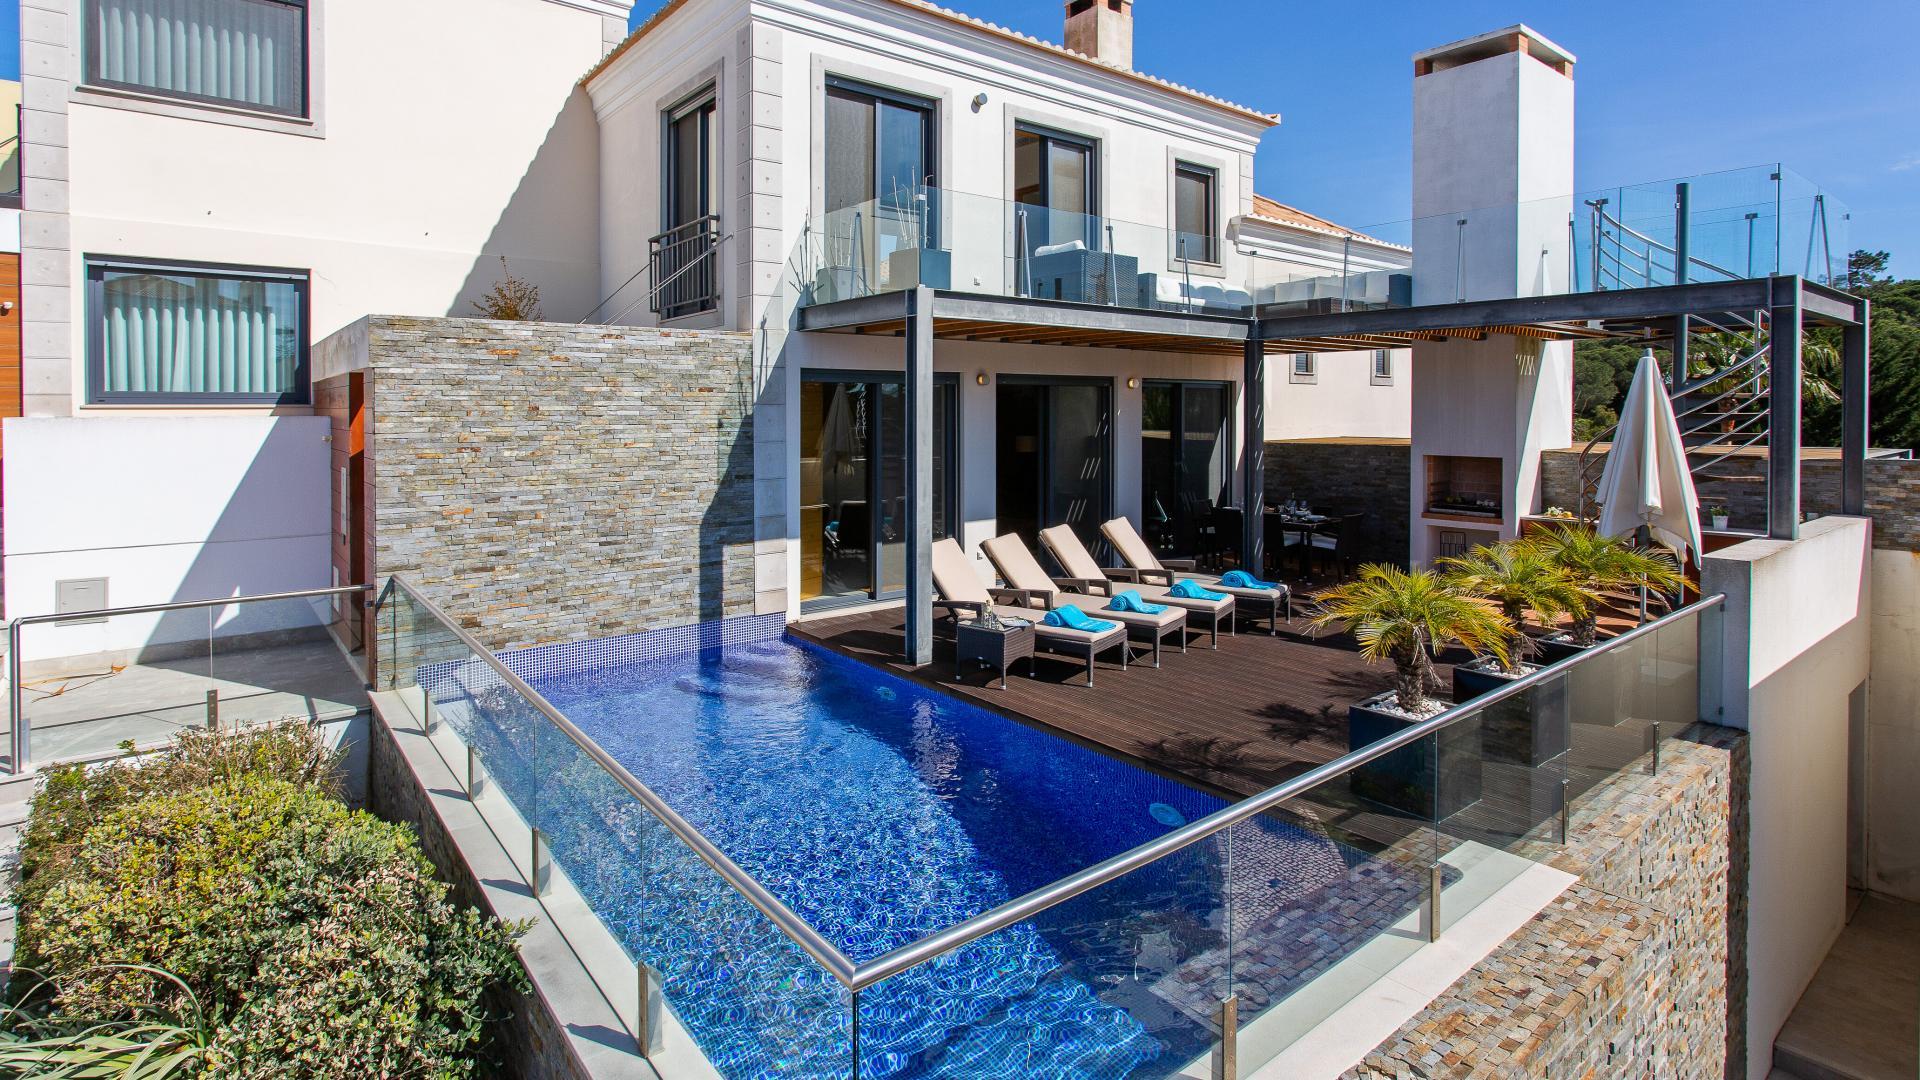 Casa Orion - Margarida Apartments, Vale do Lobo, Algarve - 1.png